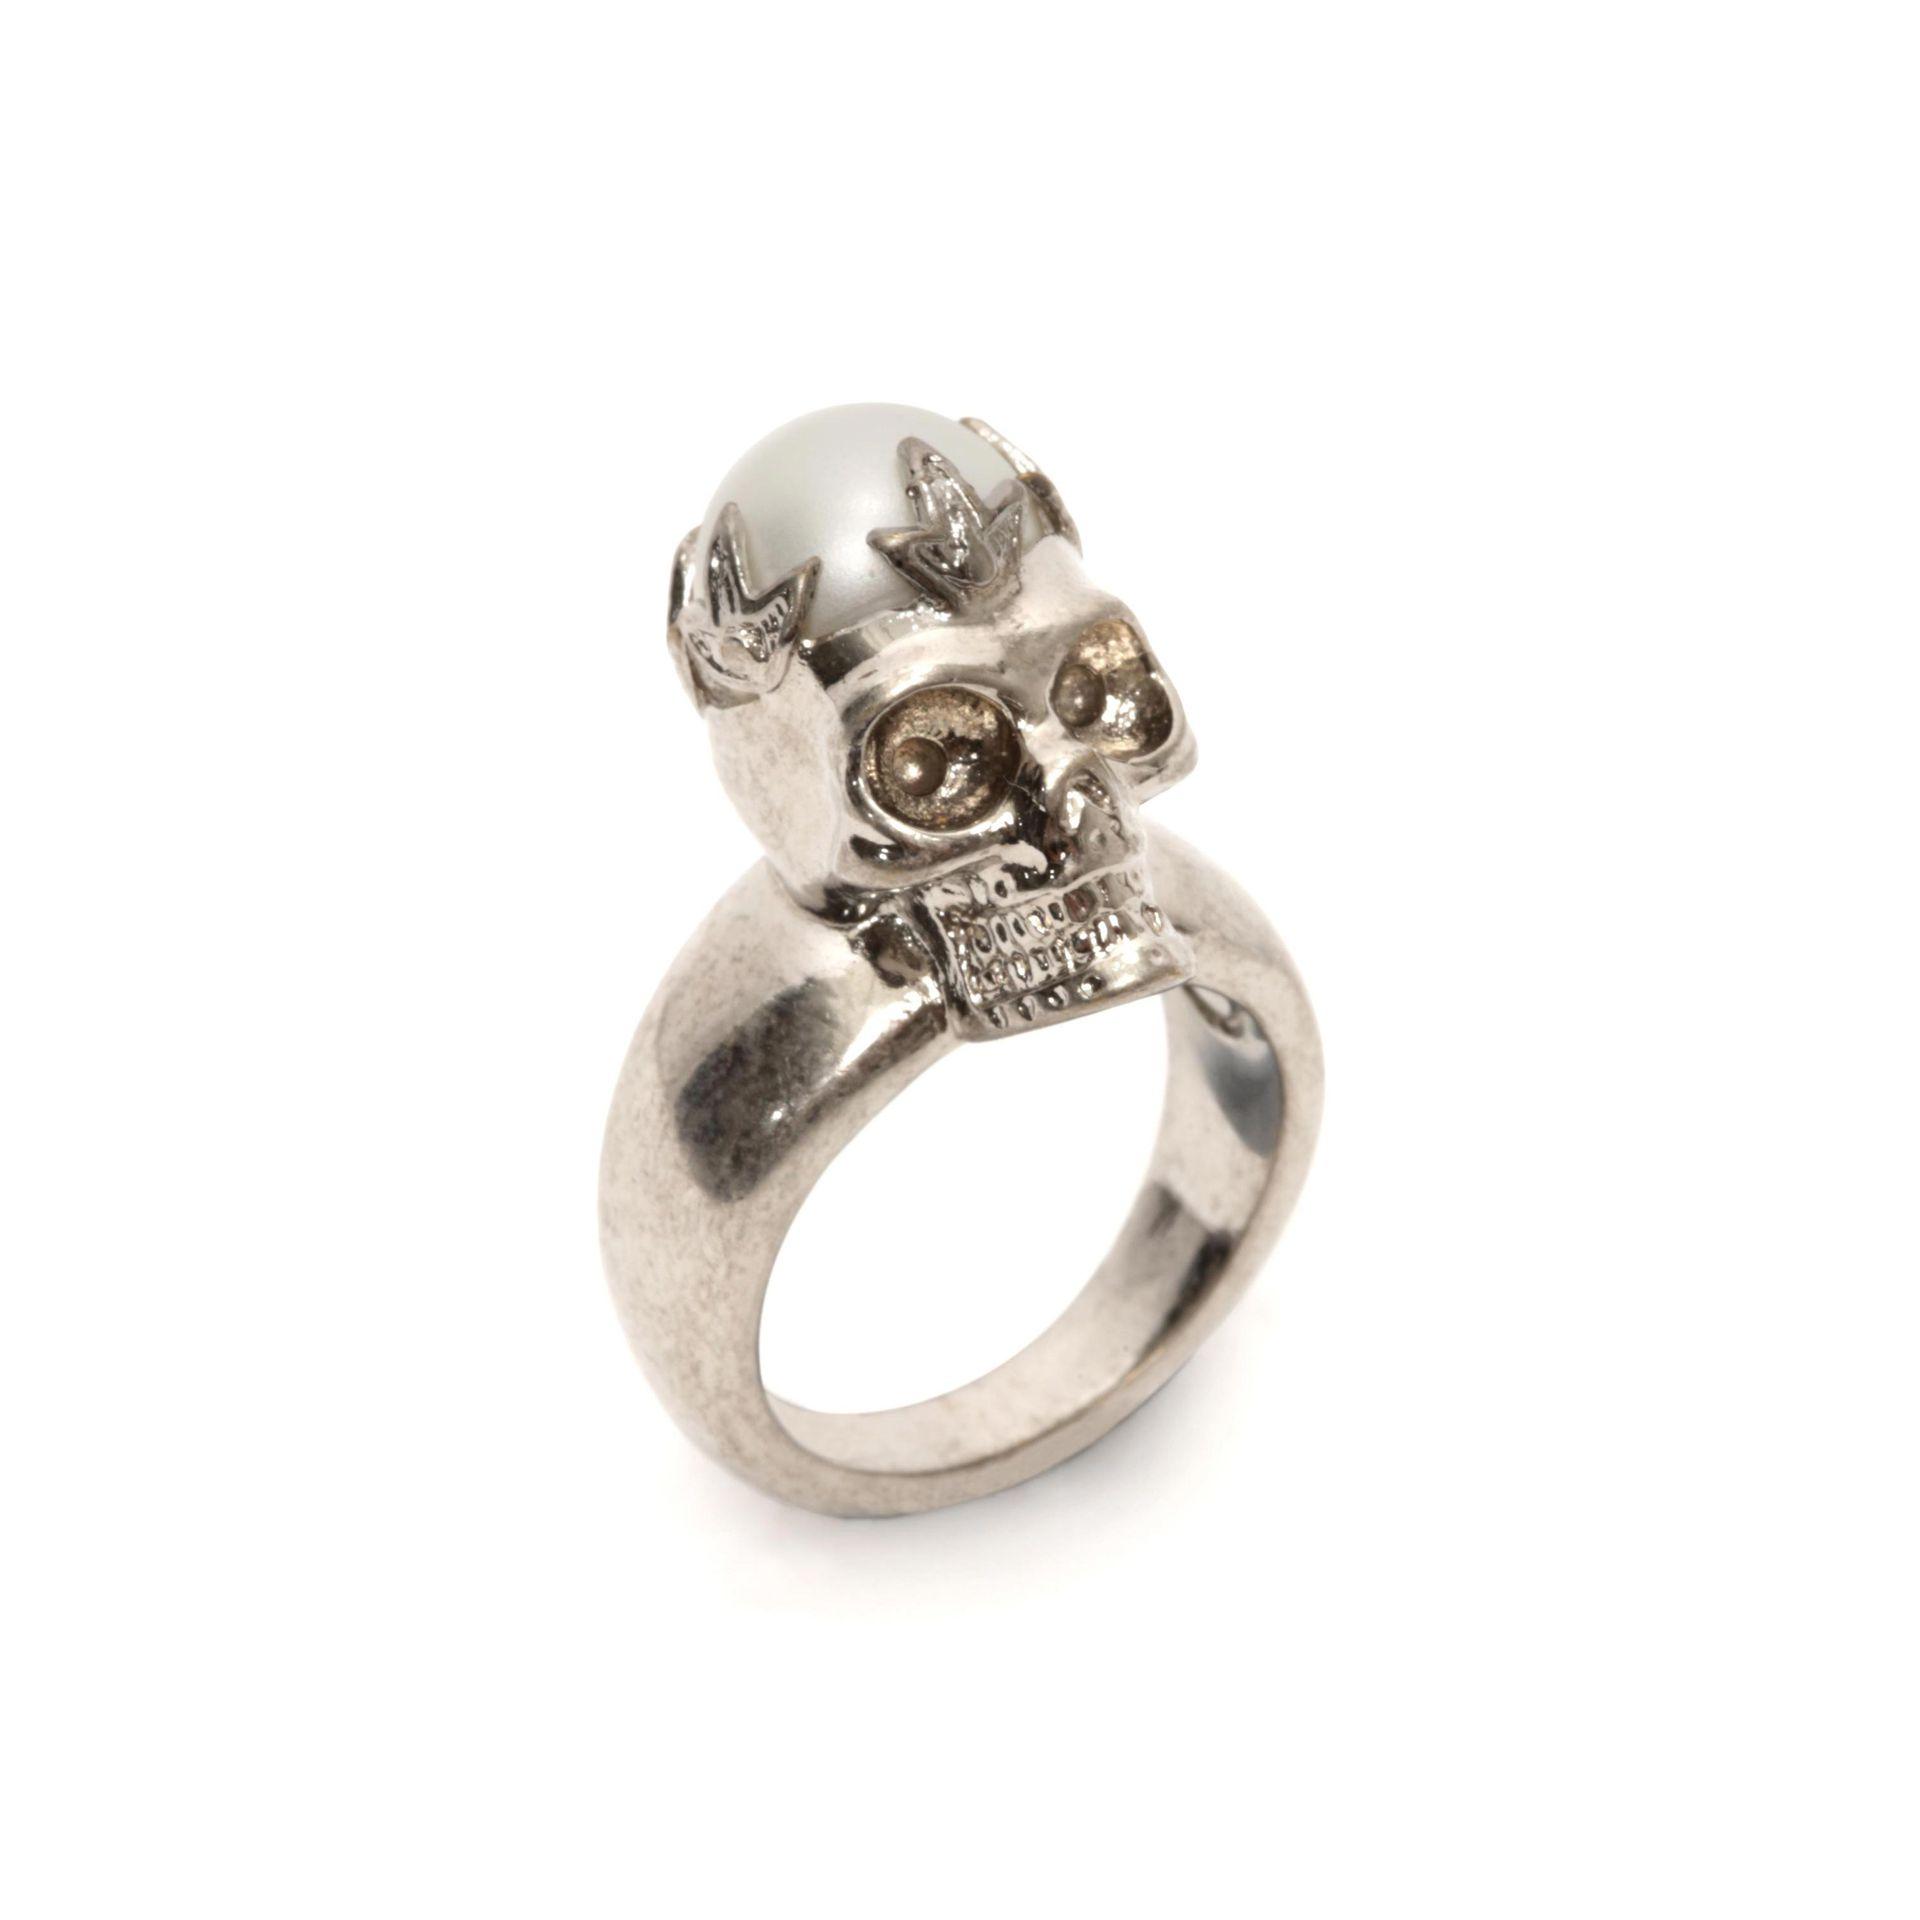 Alexander mcqueen Pearl Crown Skull Ring in Metallic